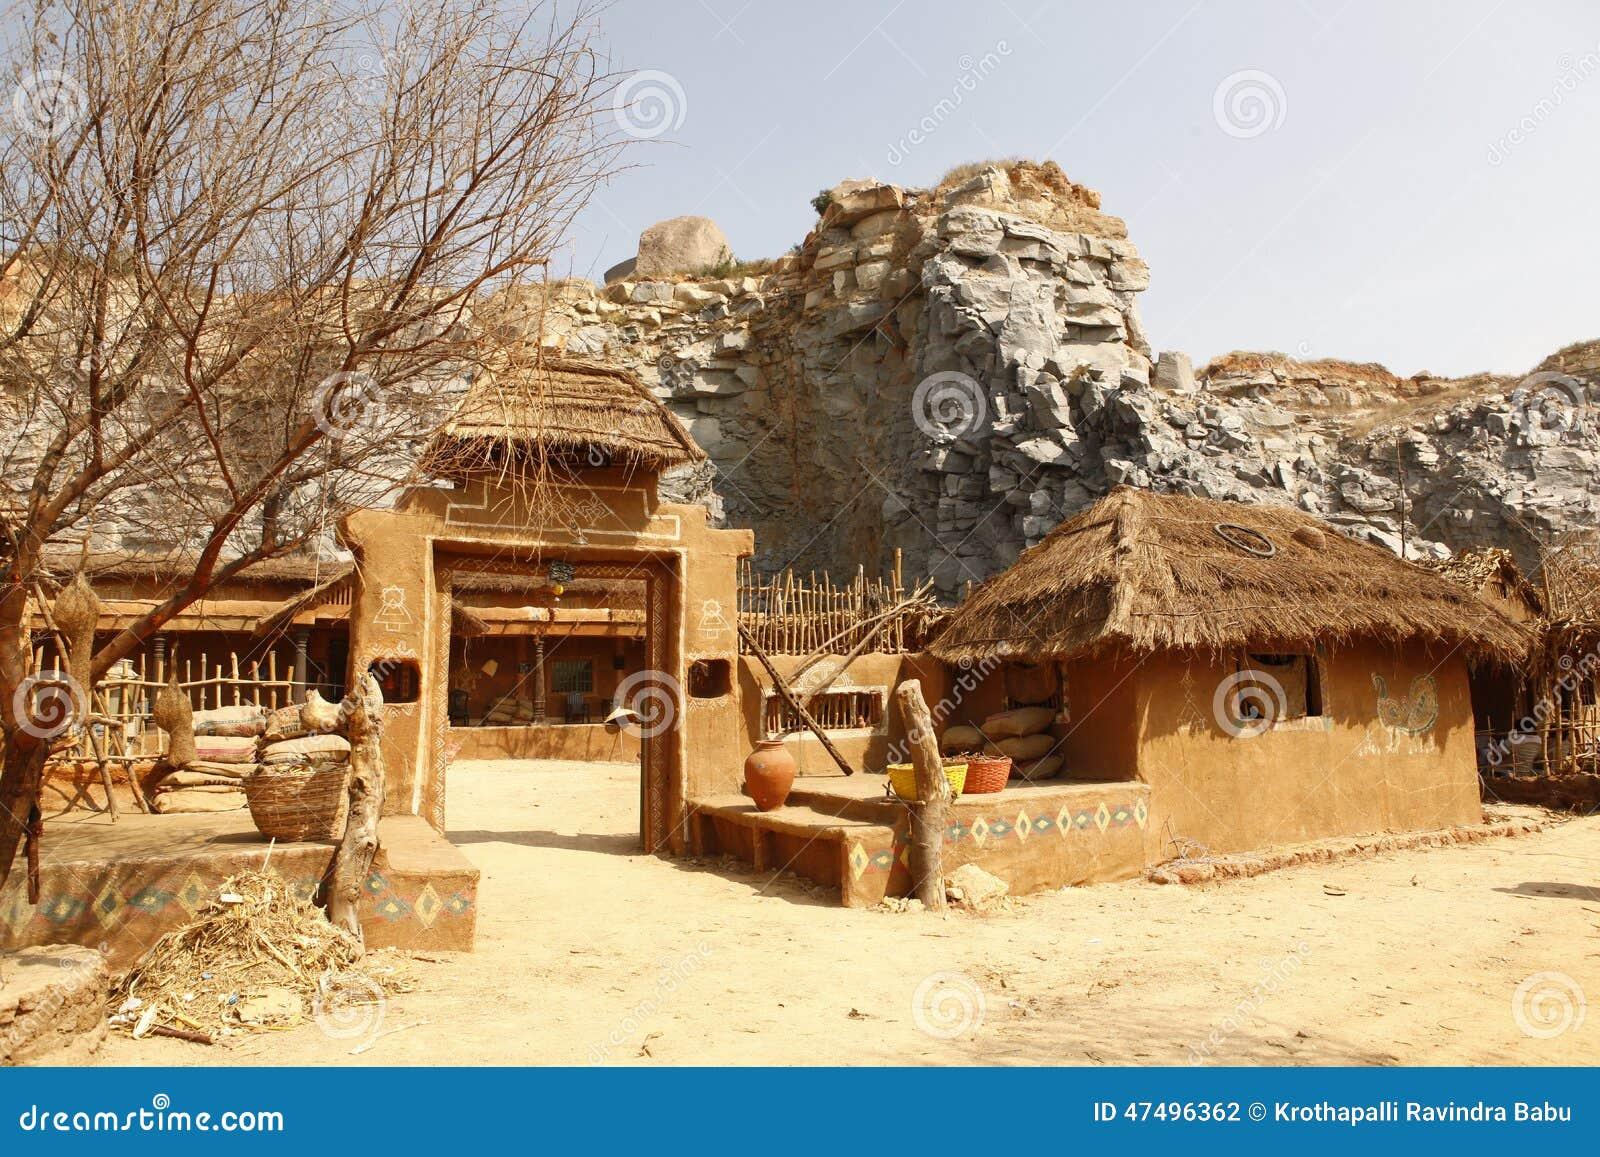 Home Design Rajasthan - HomeRiview